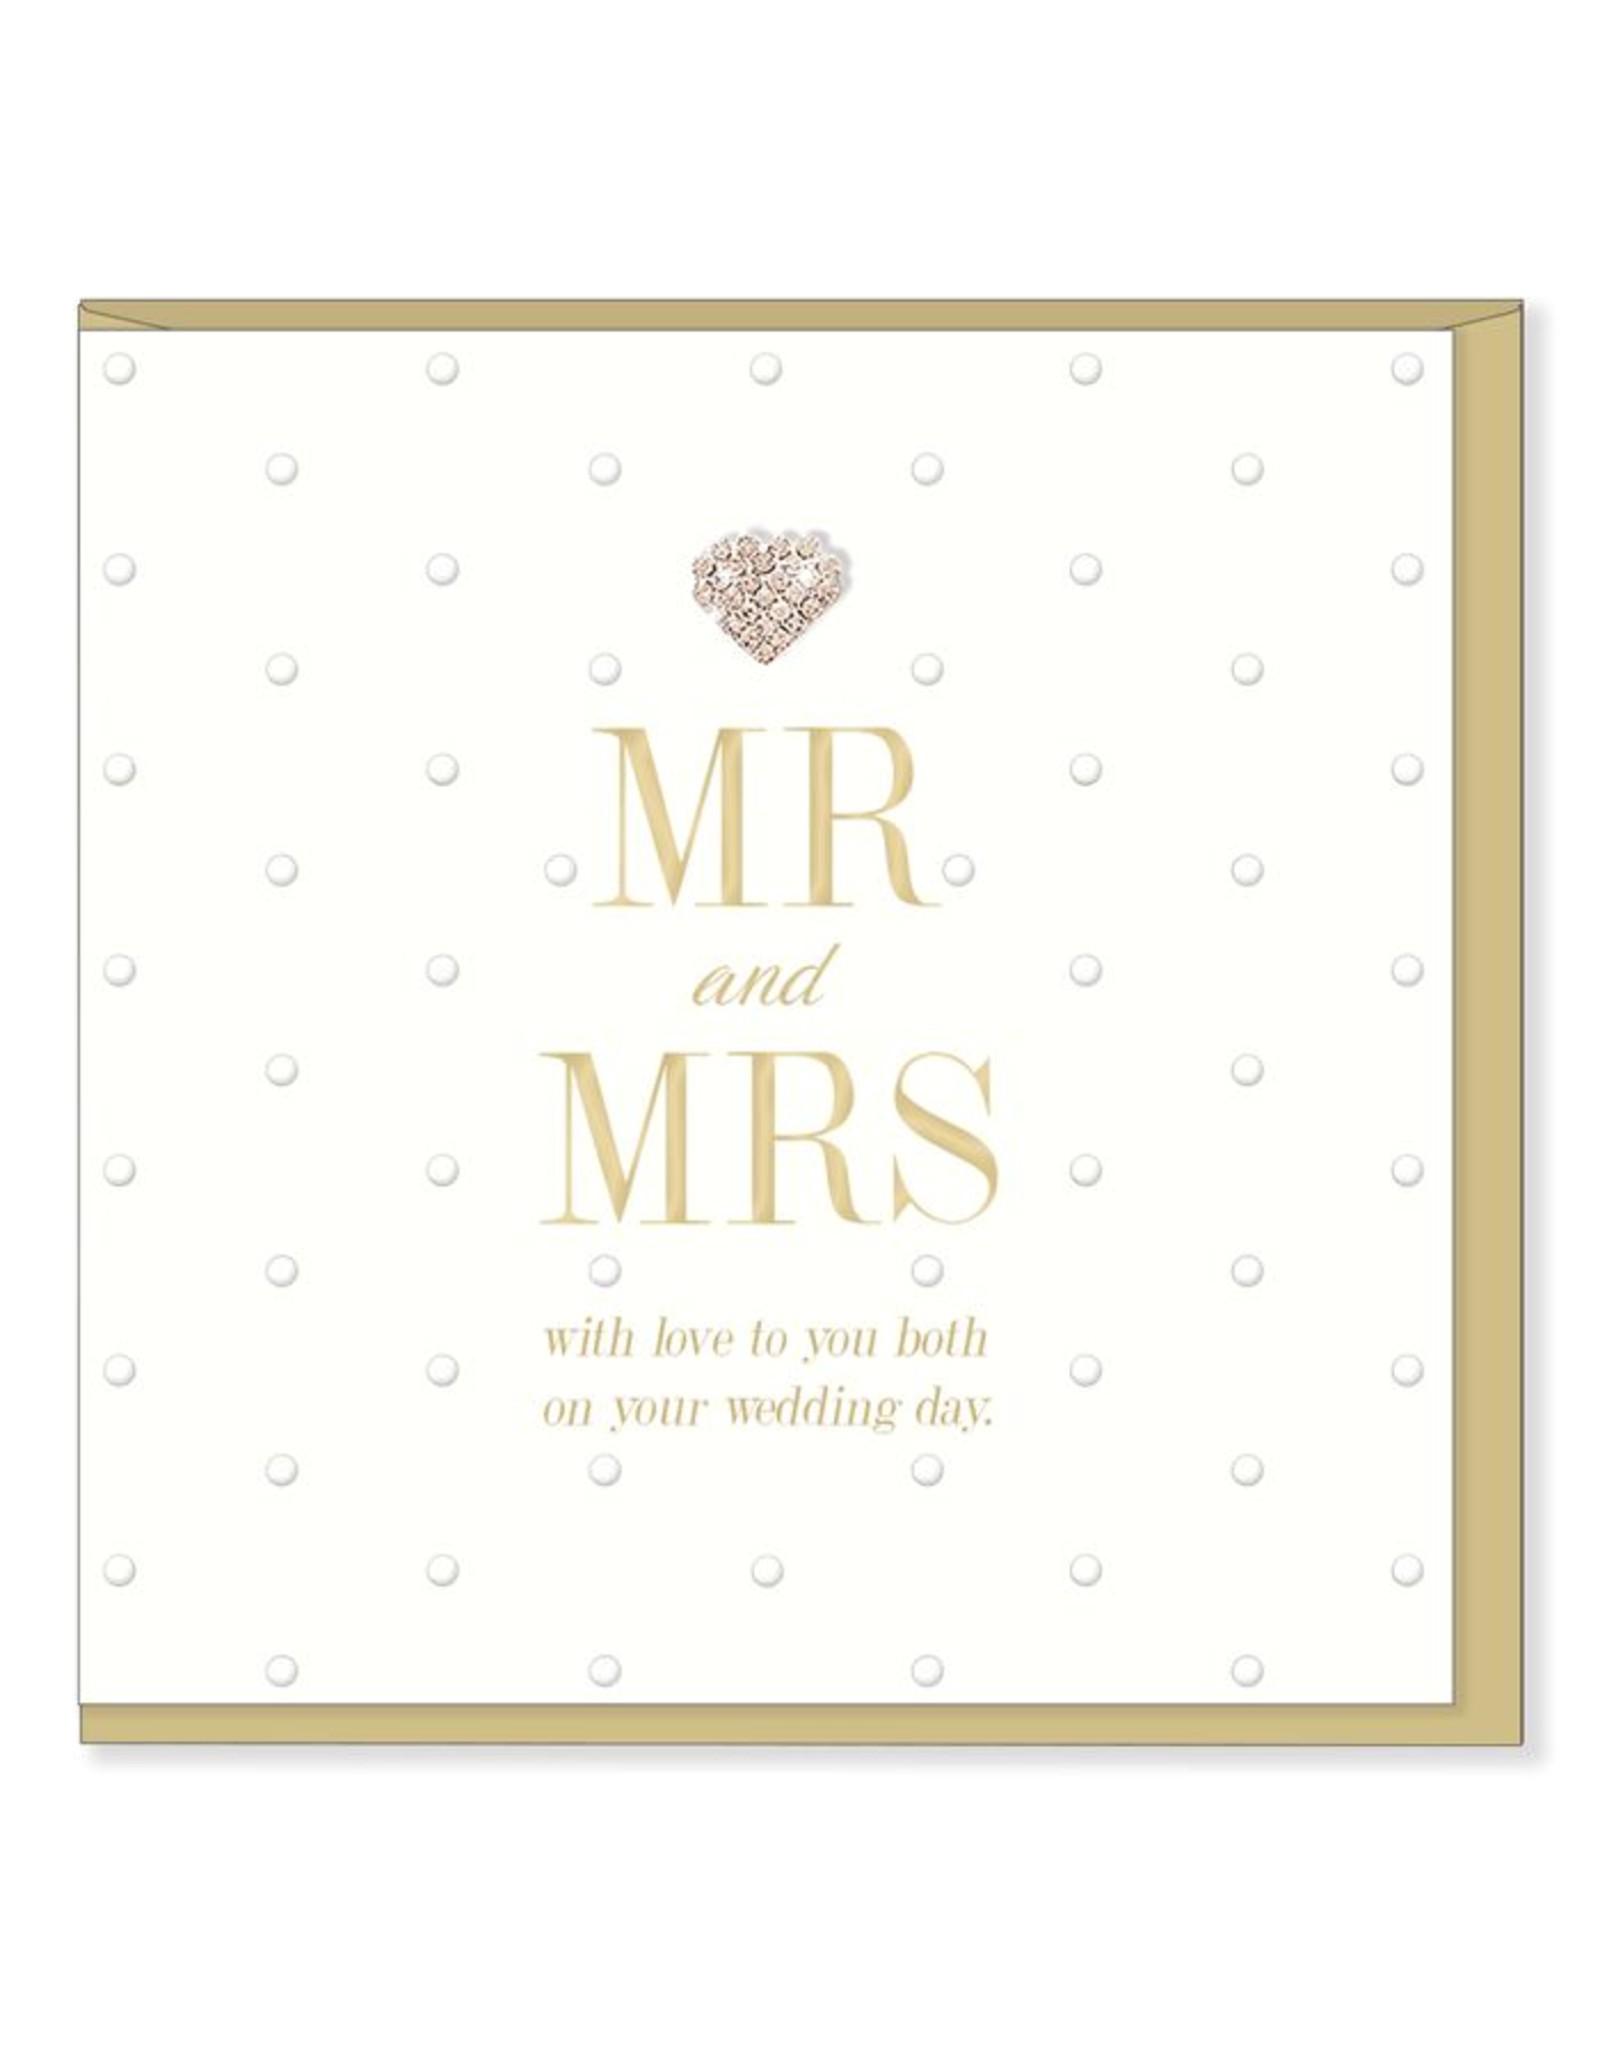 Hearts Design Wenskaart - MR & MRS